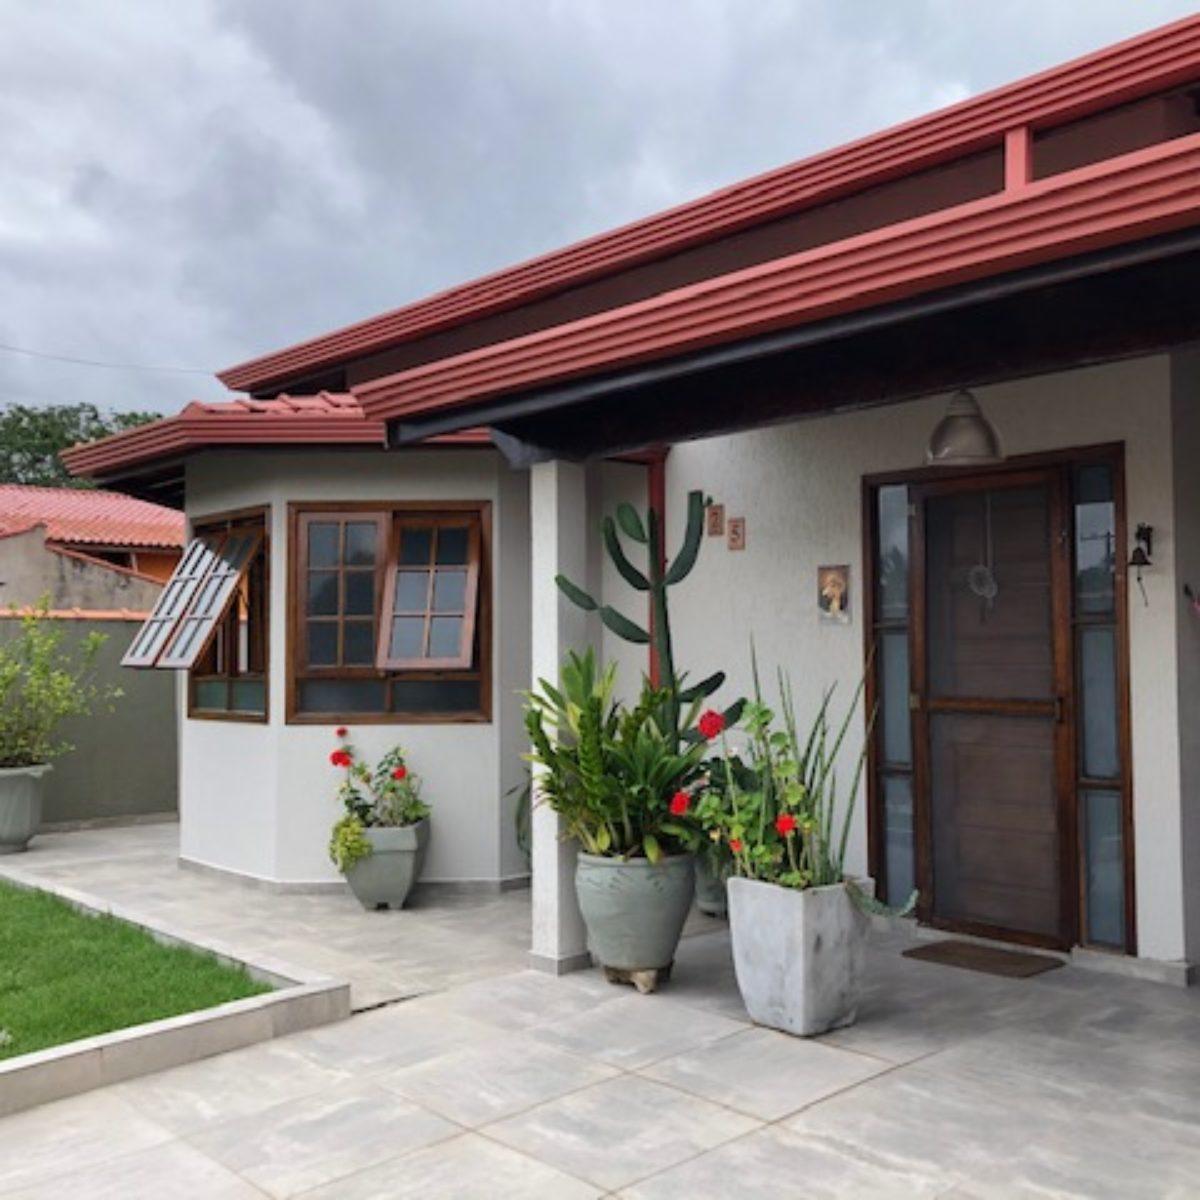 Ref.: R$540.000,00 03 Dorm, Sendo 02 Suites (80524)